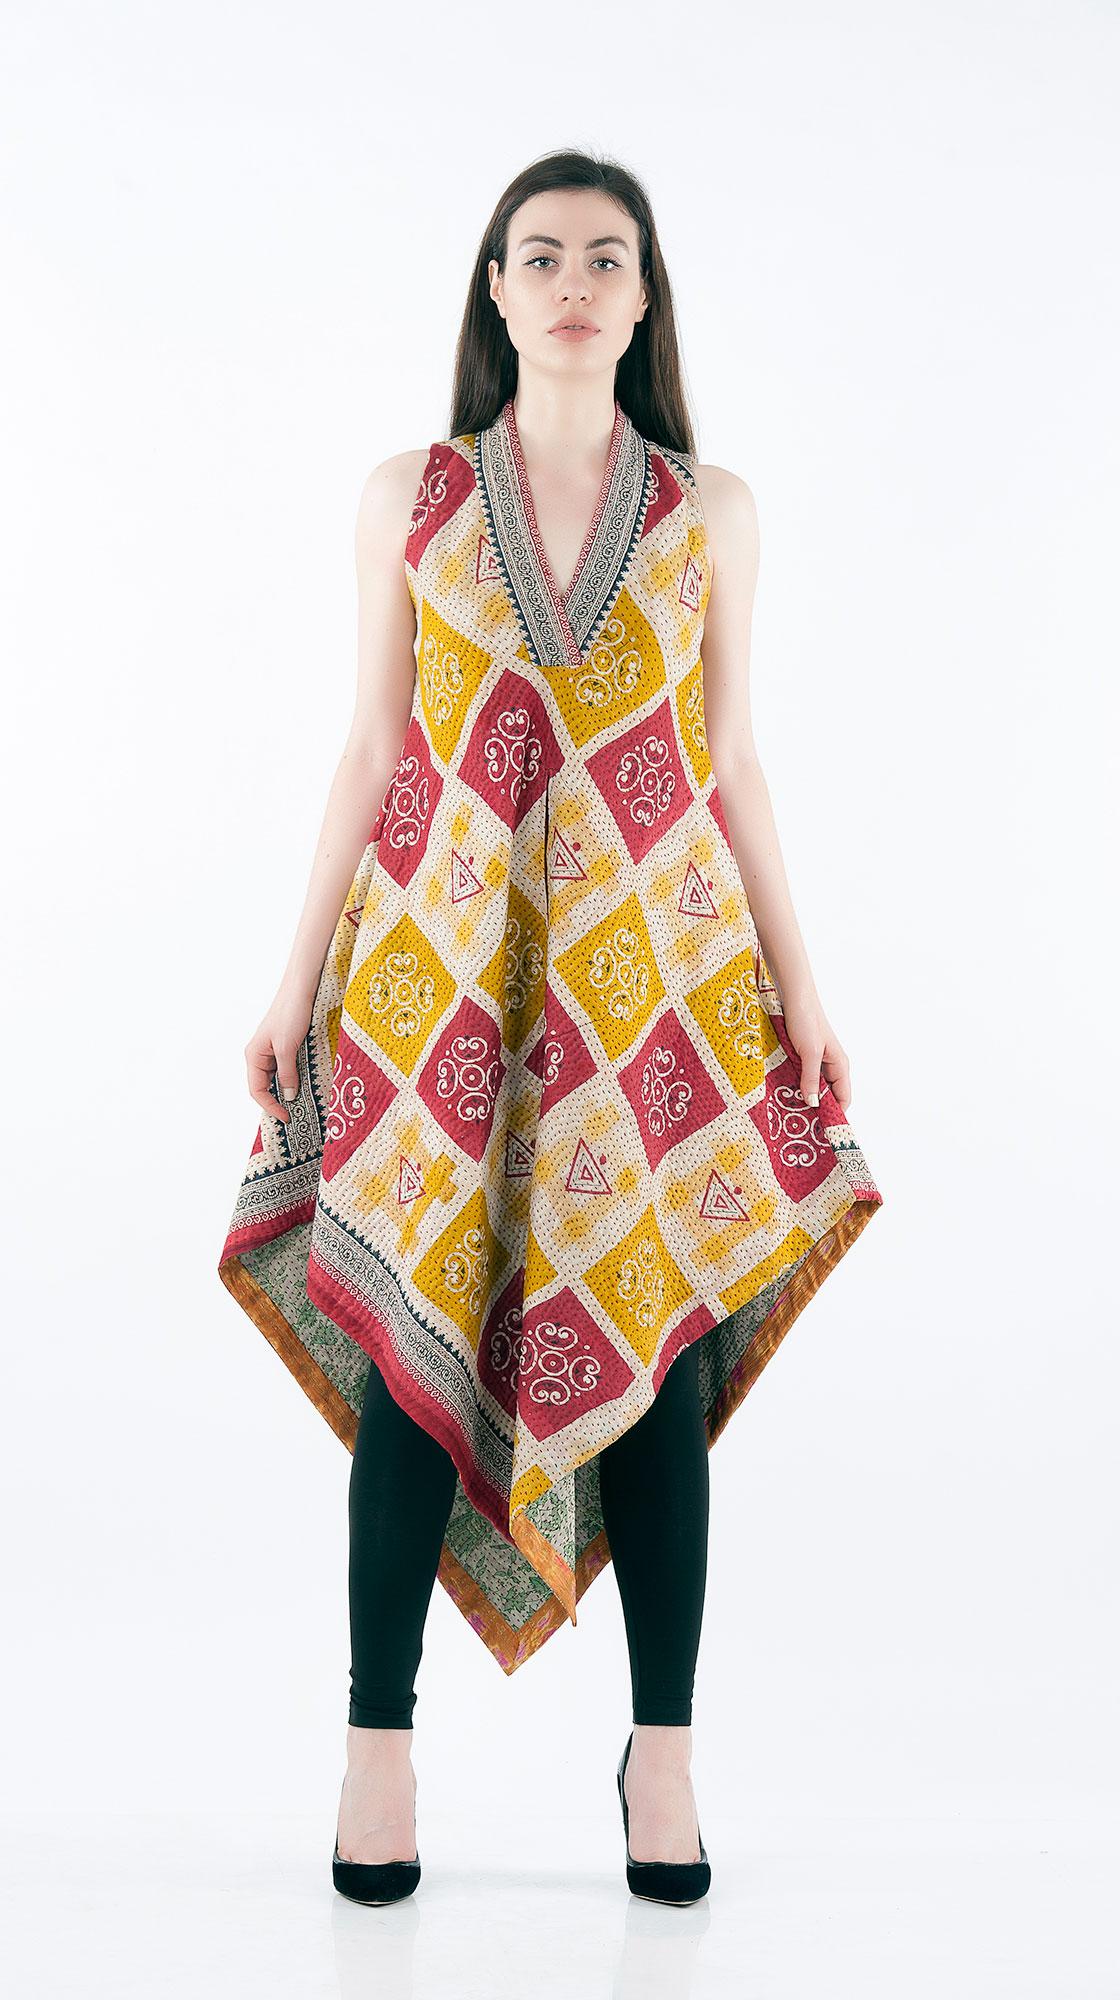 Sonam Dubal Bias Pointed Dress with Center Pocket